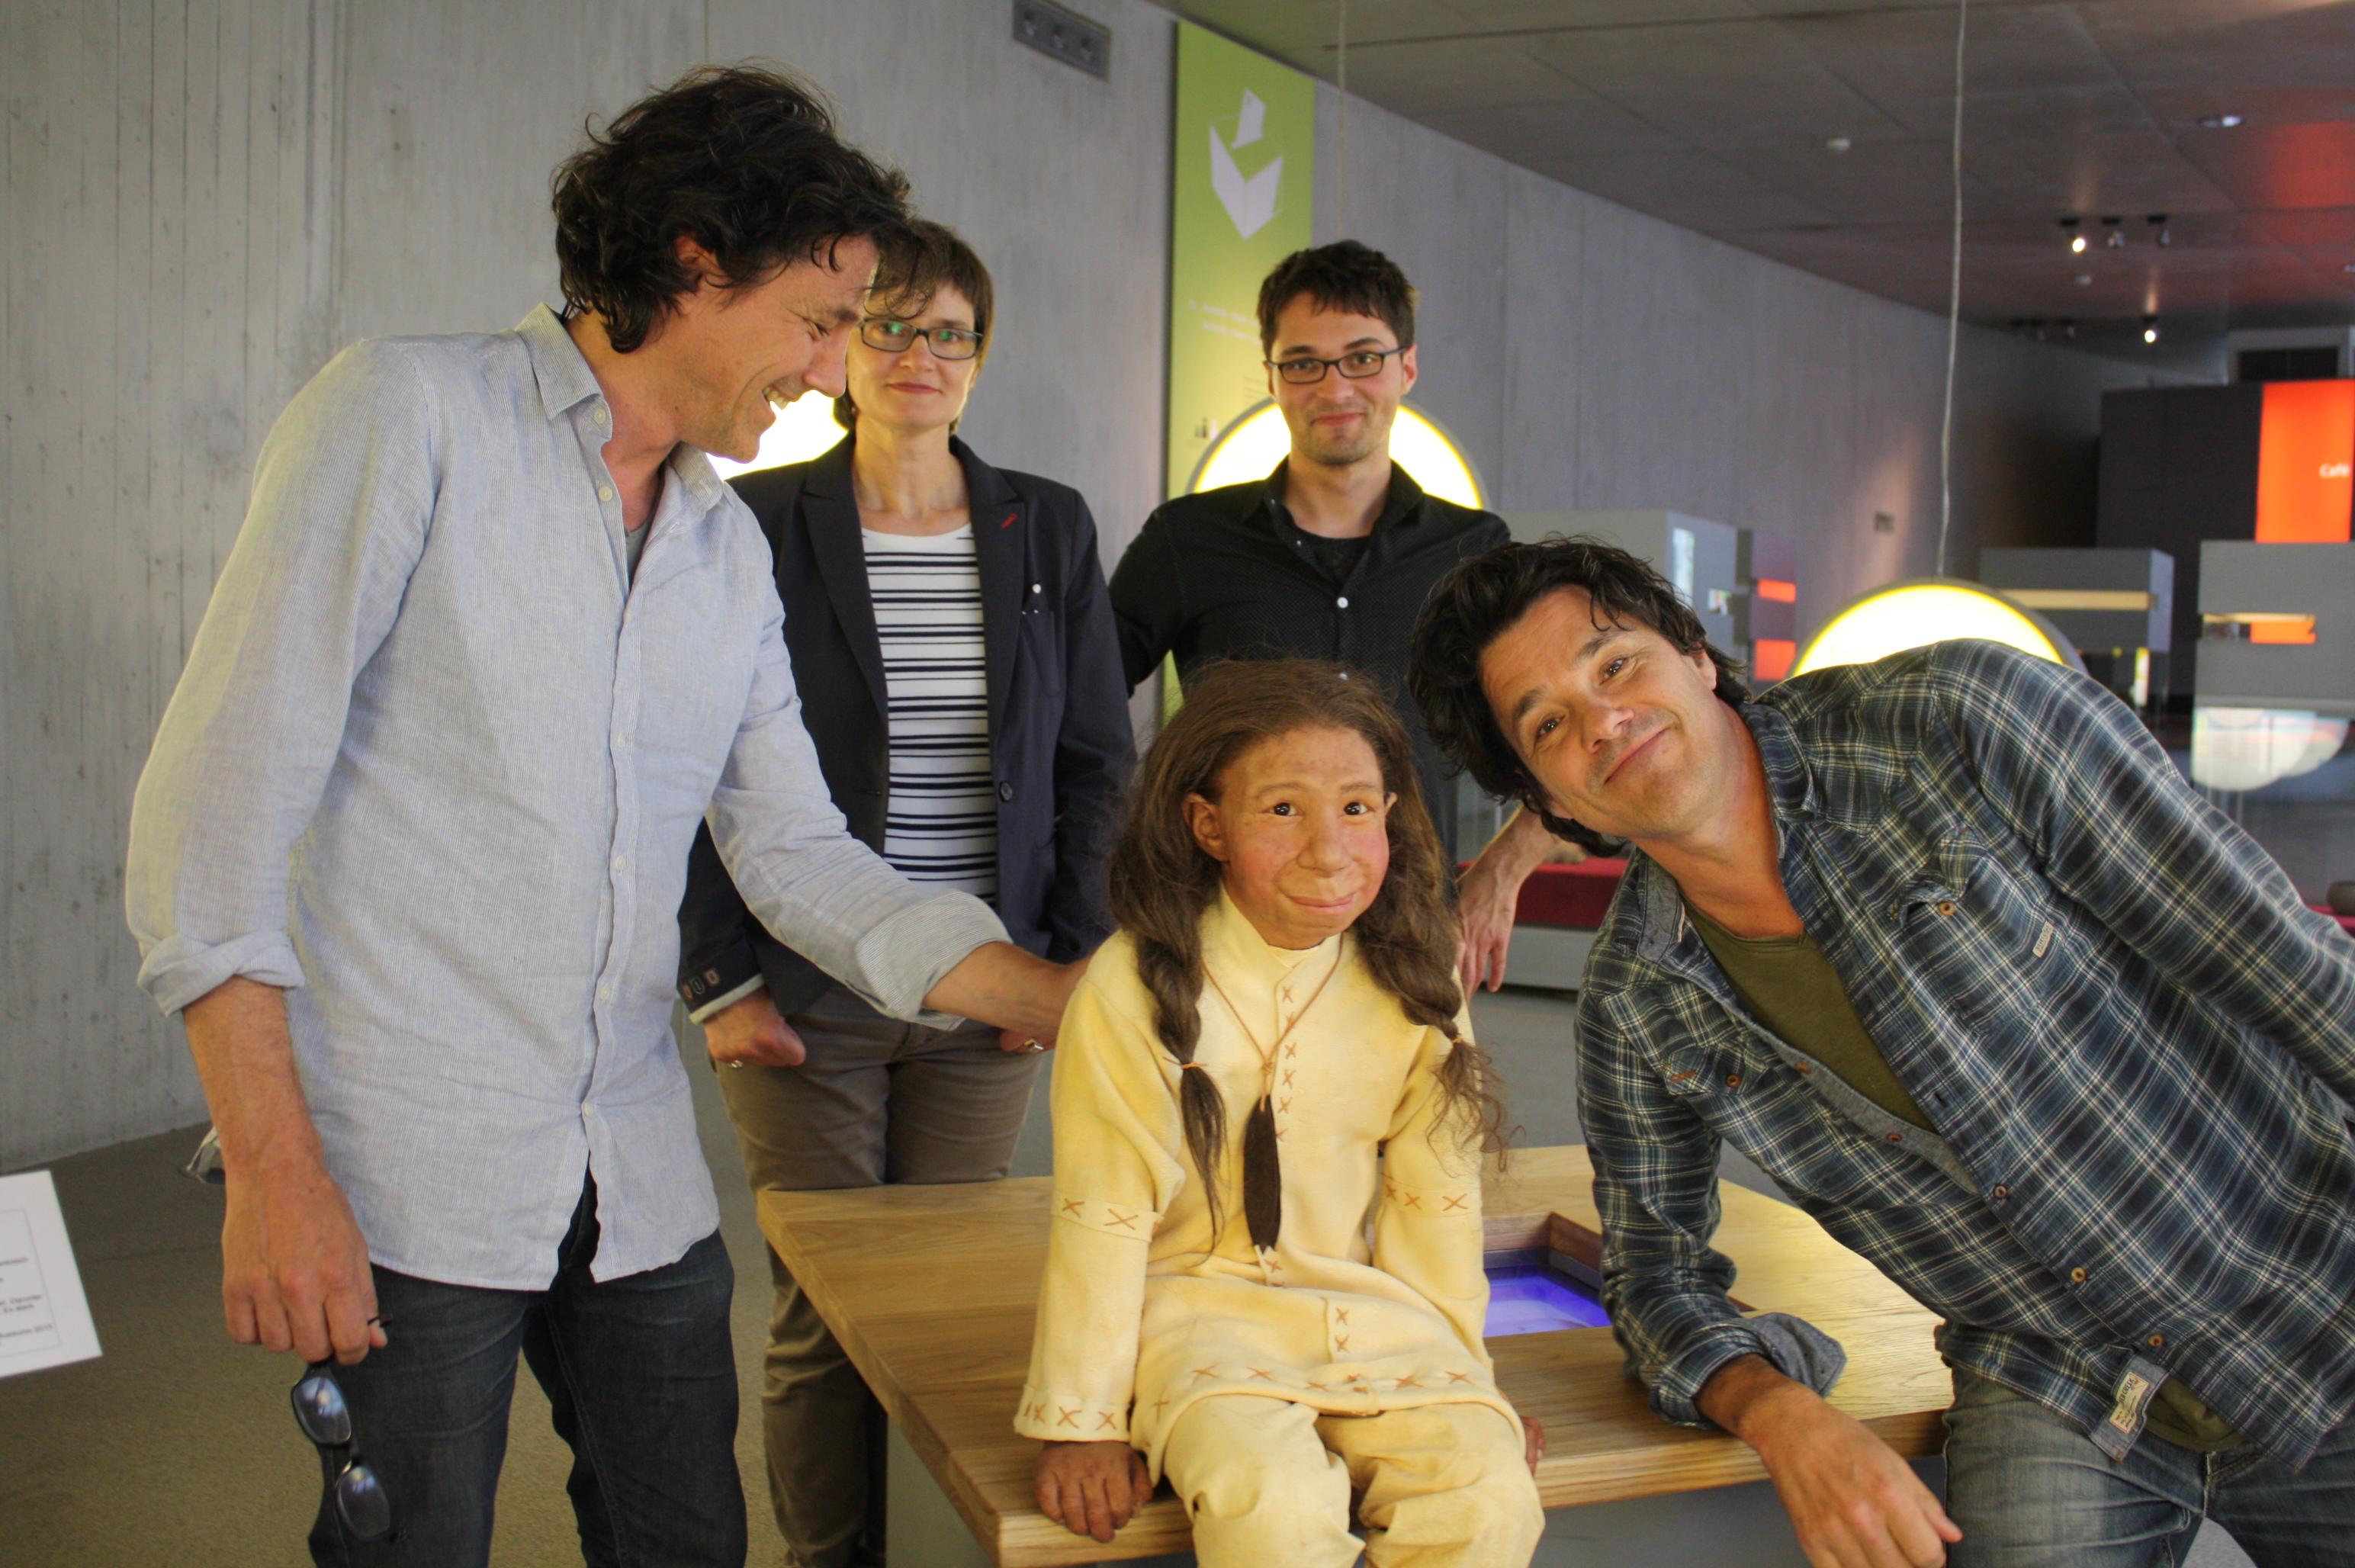 Familienzuwachs im Neanderthal Museum (Foto: Neanderthal Museum)